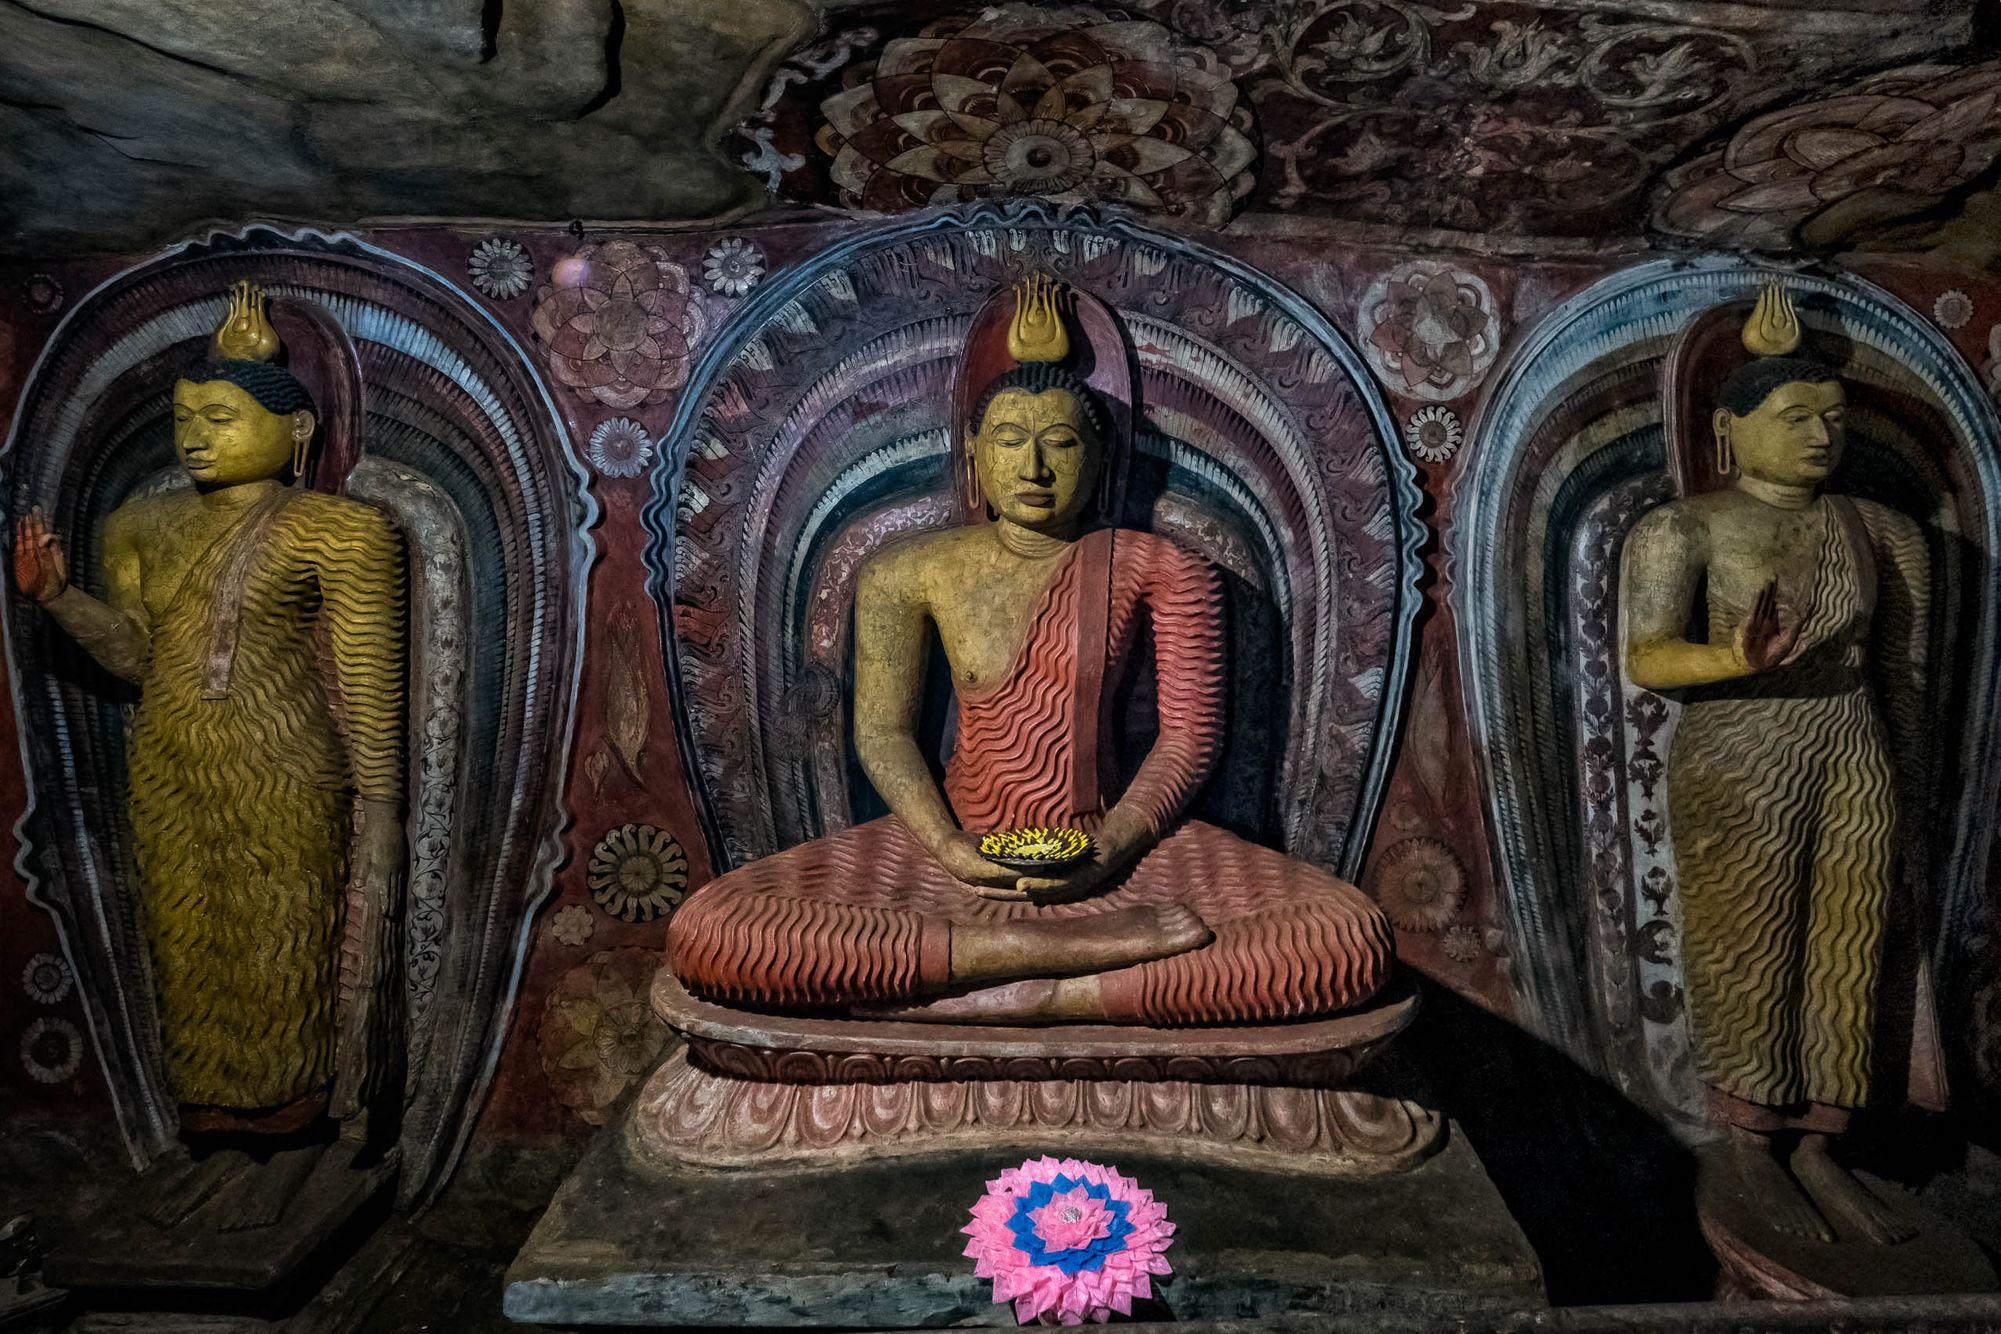 SRI LANKA:  Buddhist Arts in Cave Shrines, Tampitas and Temple Ruins